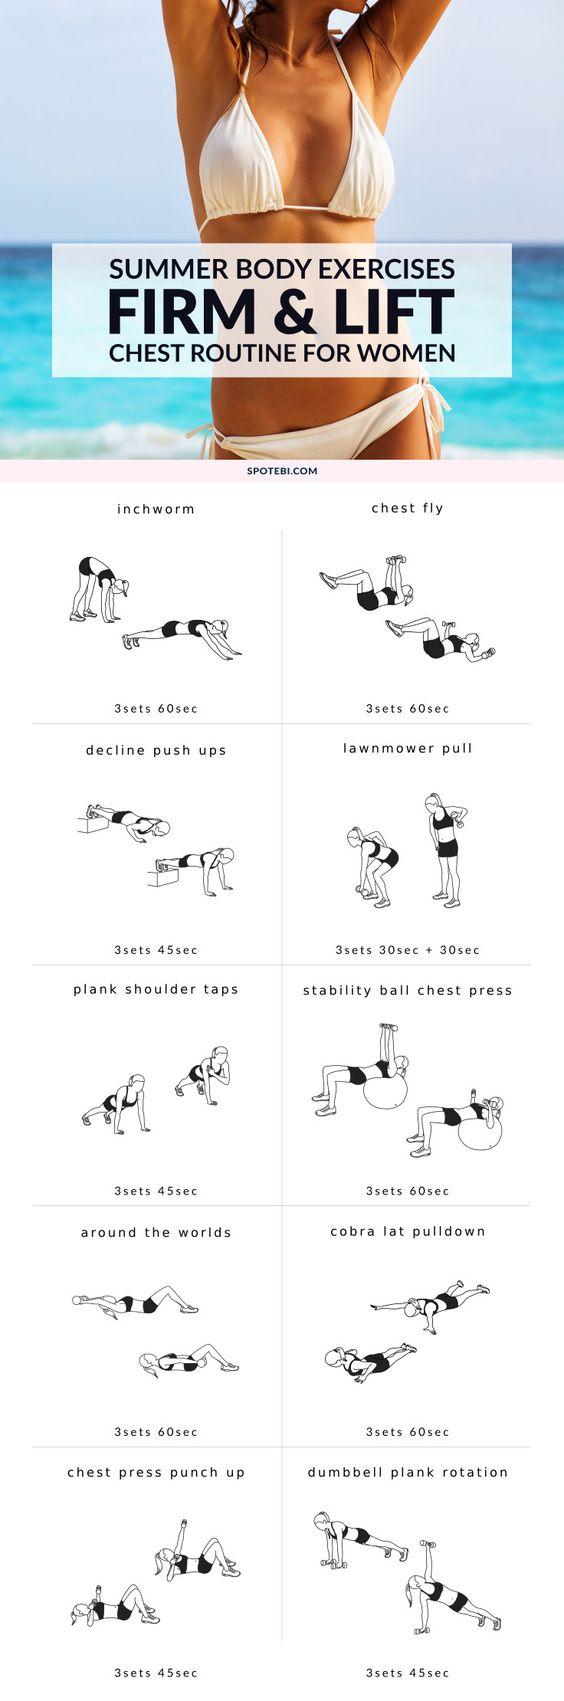 Boob Lift Exercises